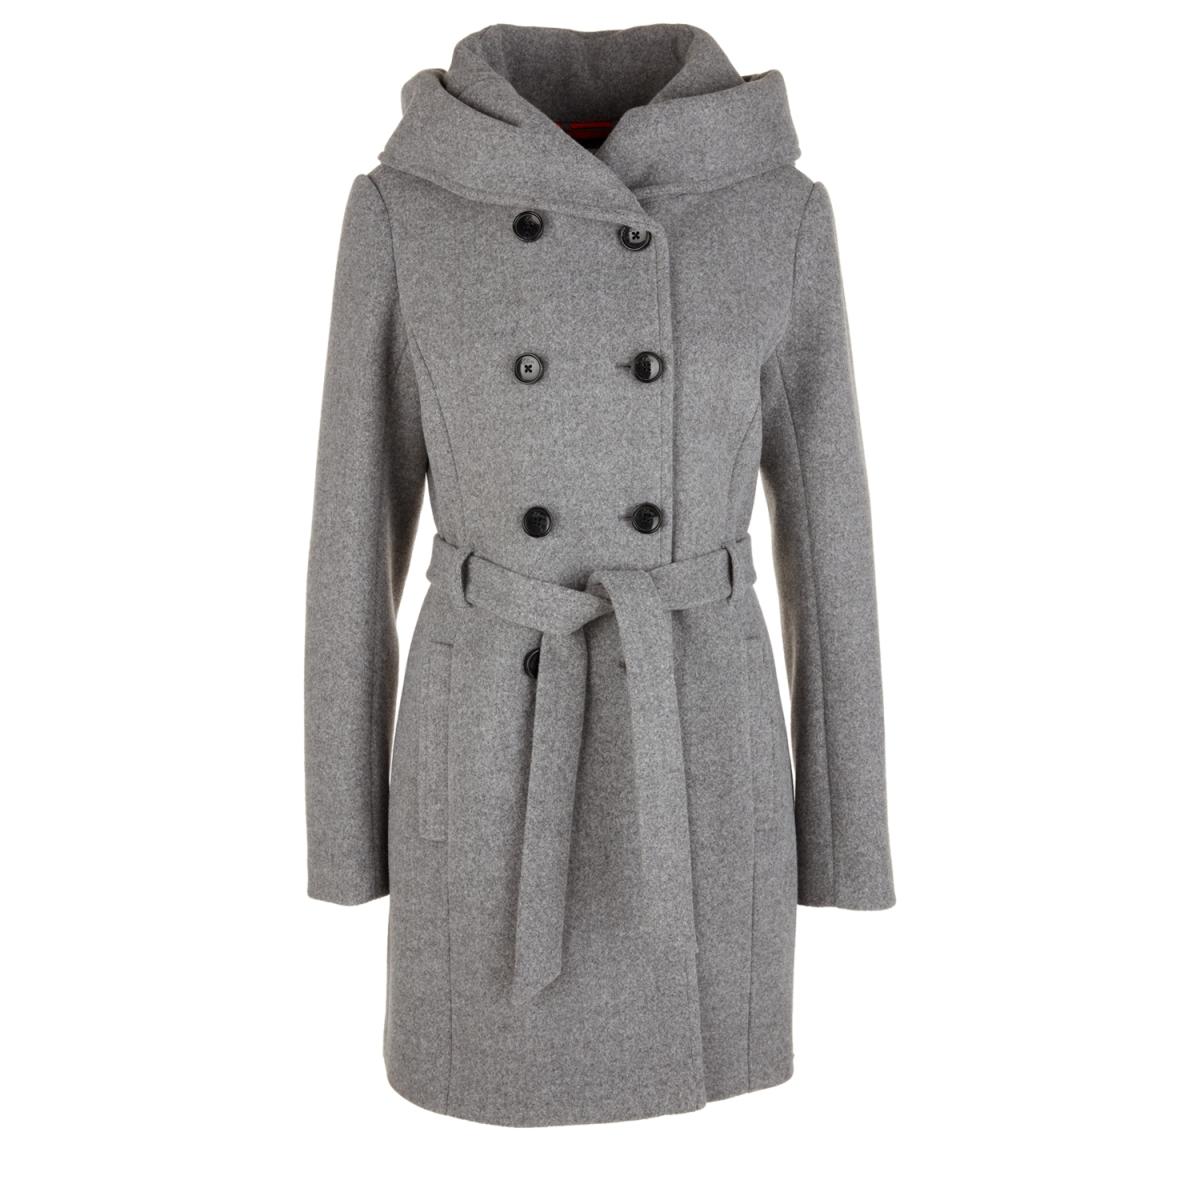 trenchcoat 04899526004 s.oliver jas 9400